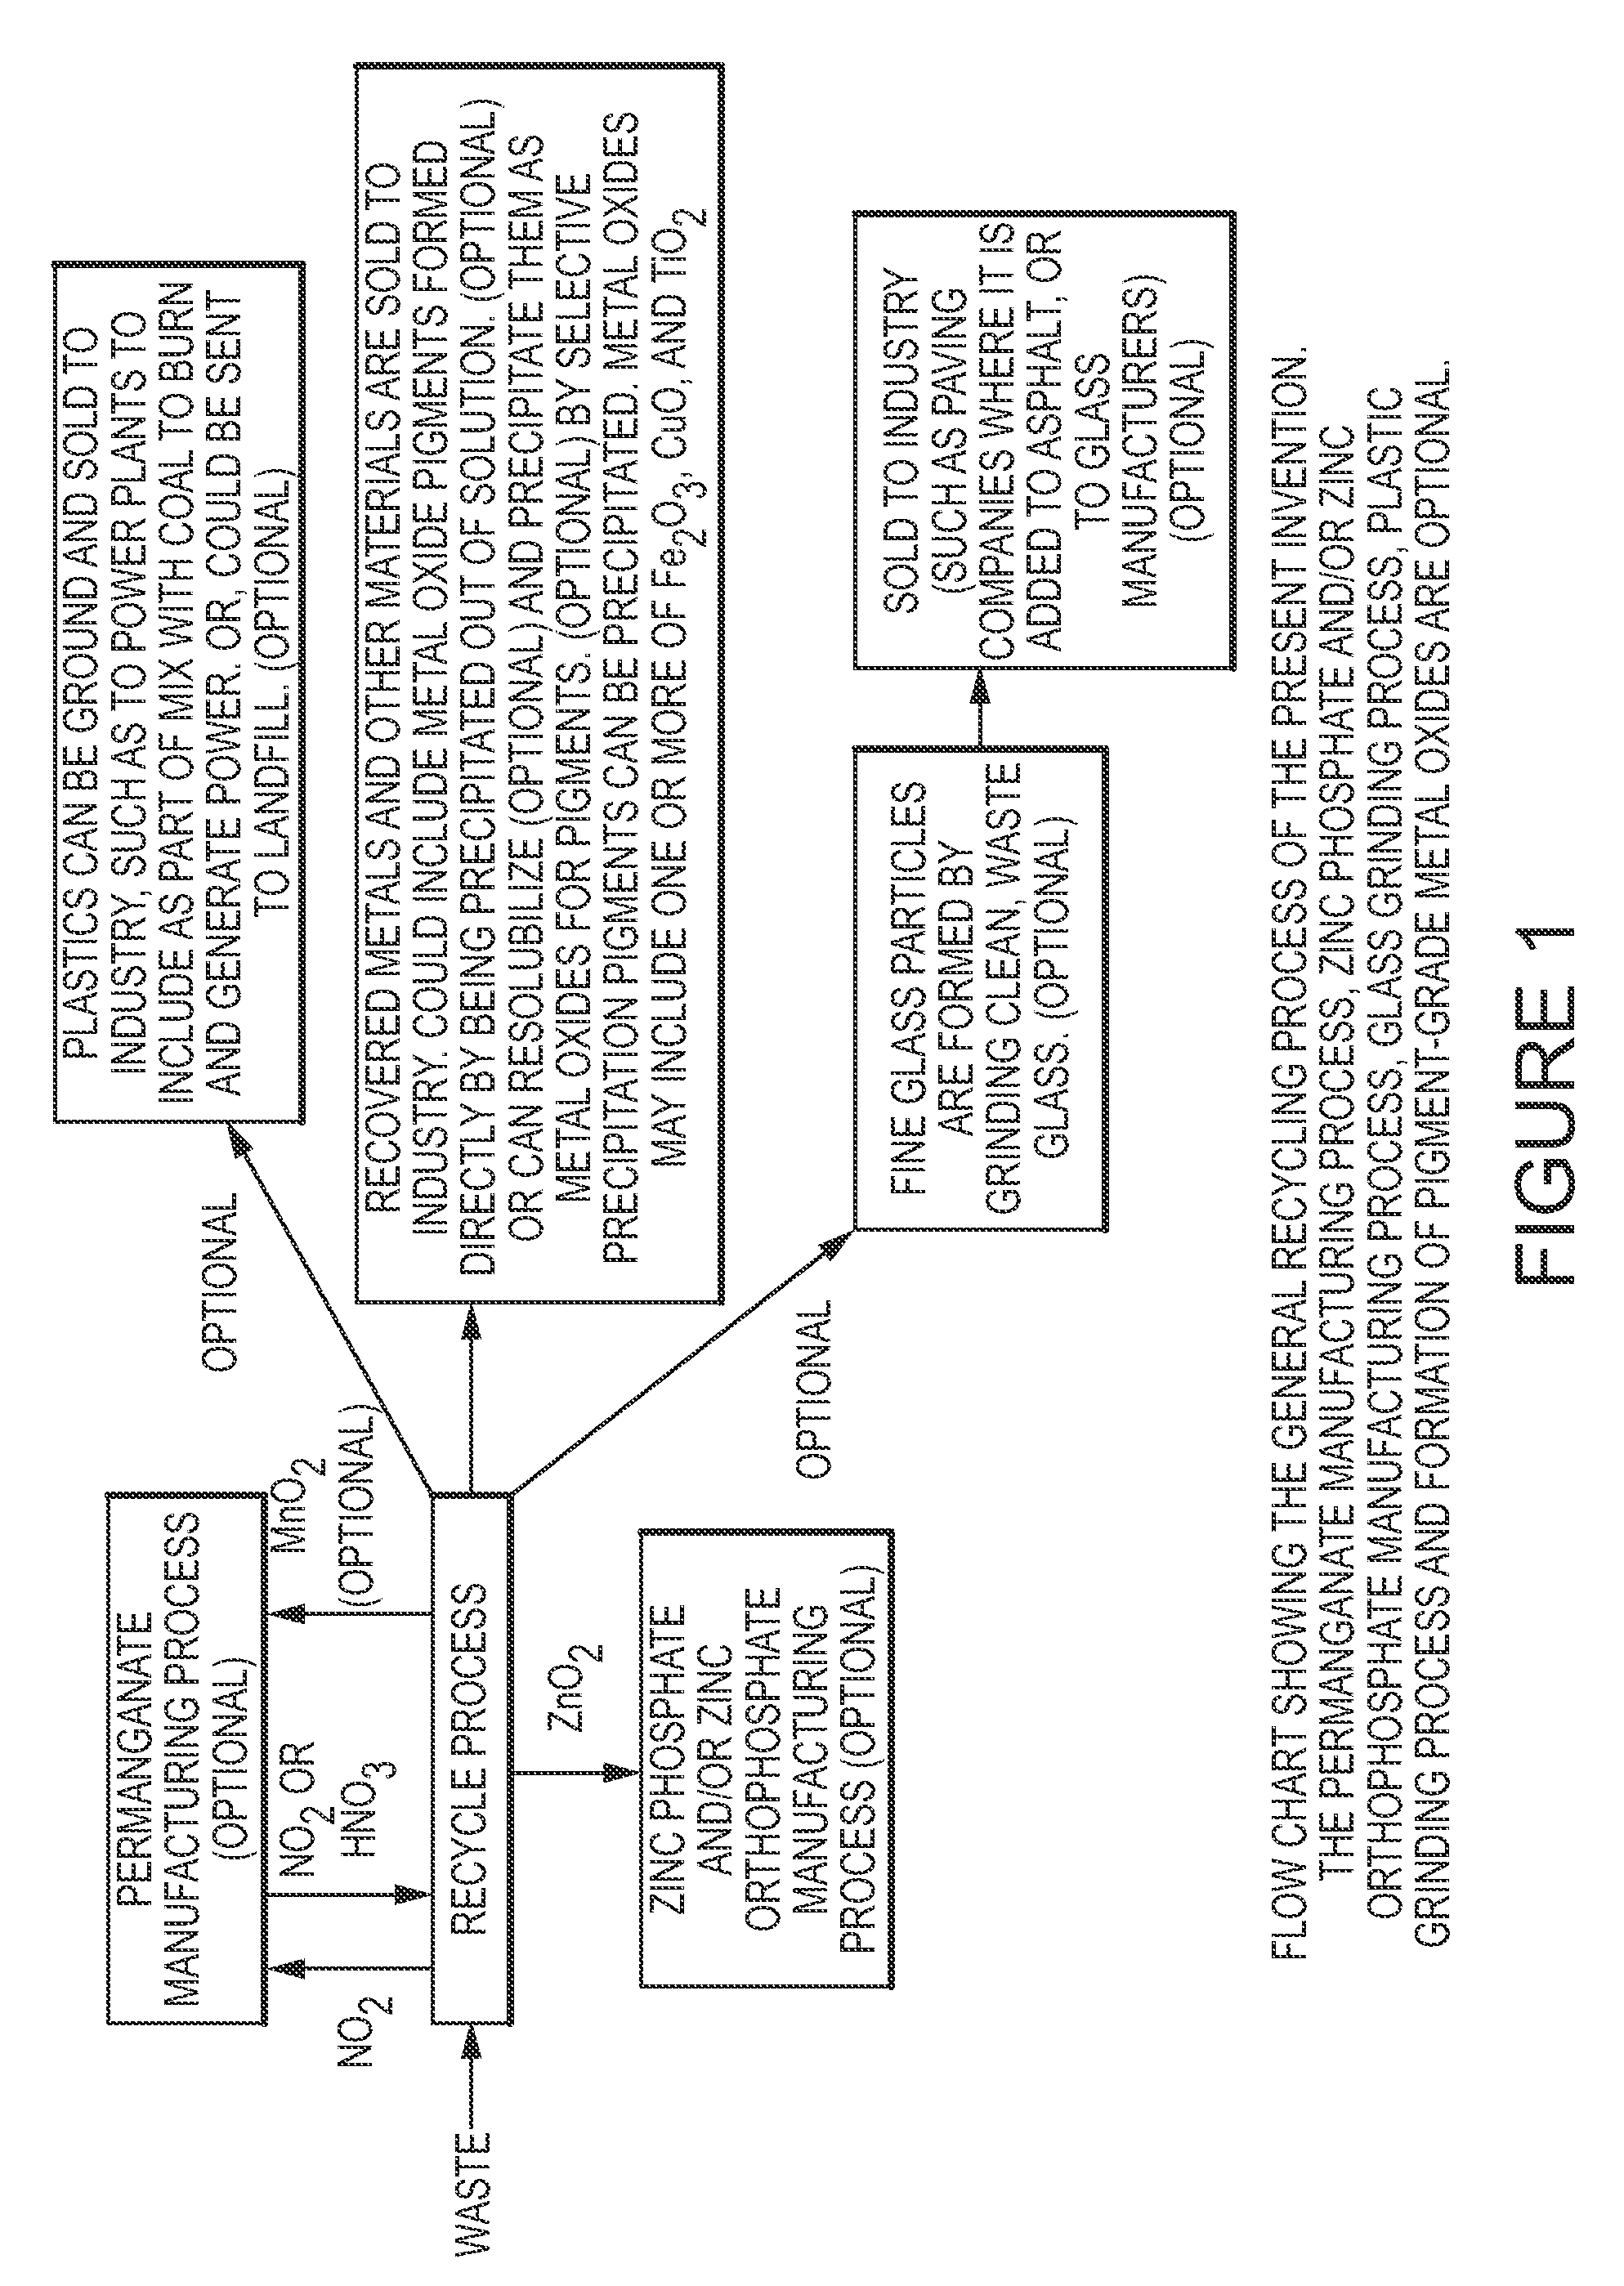 np241 transfer case wiring diagram